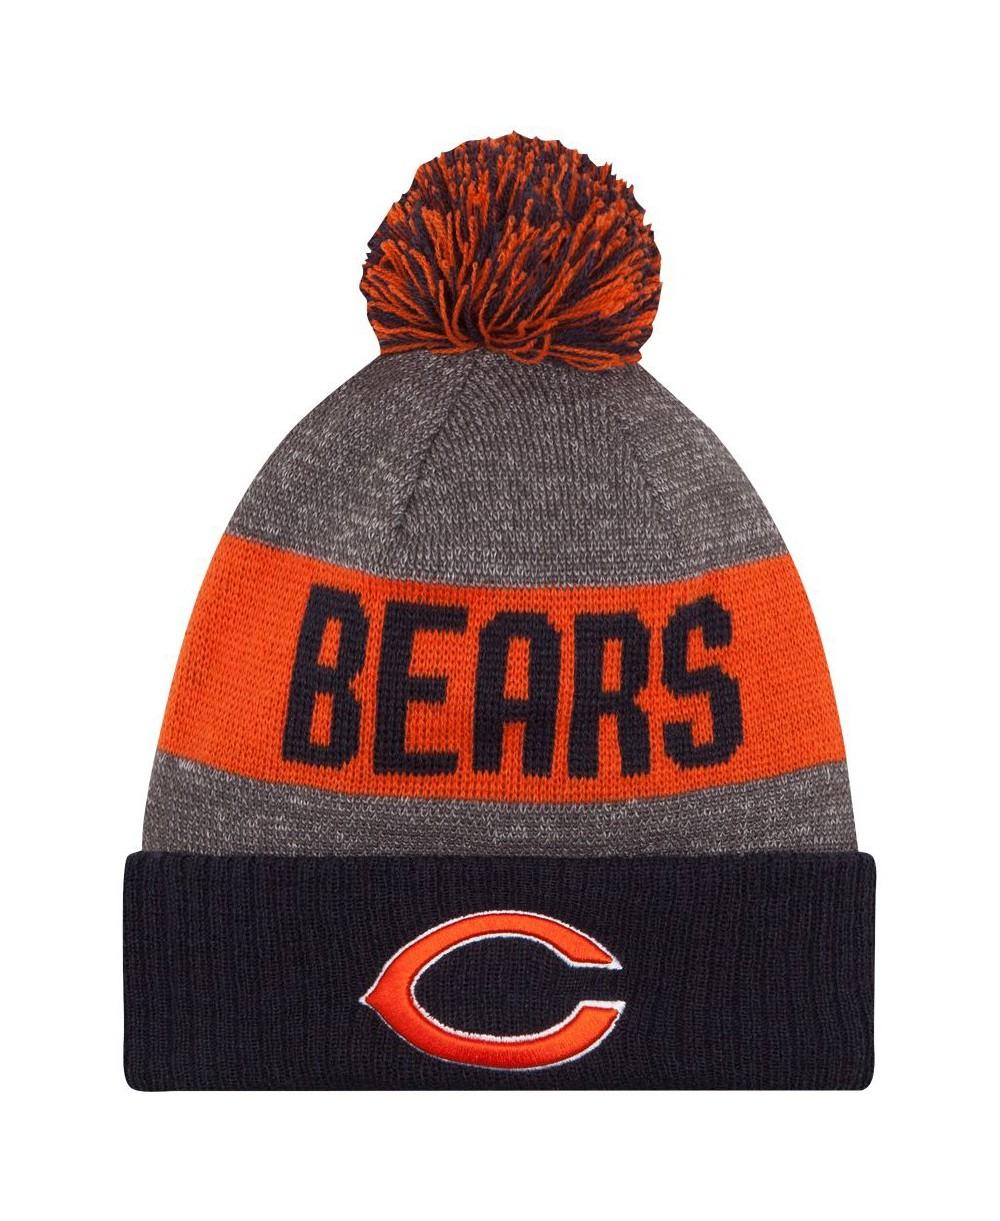 New Era NFL Sideline Gorro para Hombre Chicago Bears 3189c695d1f